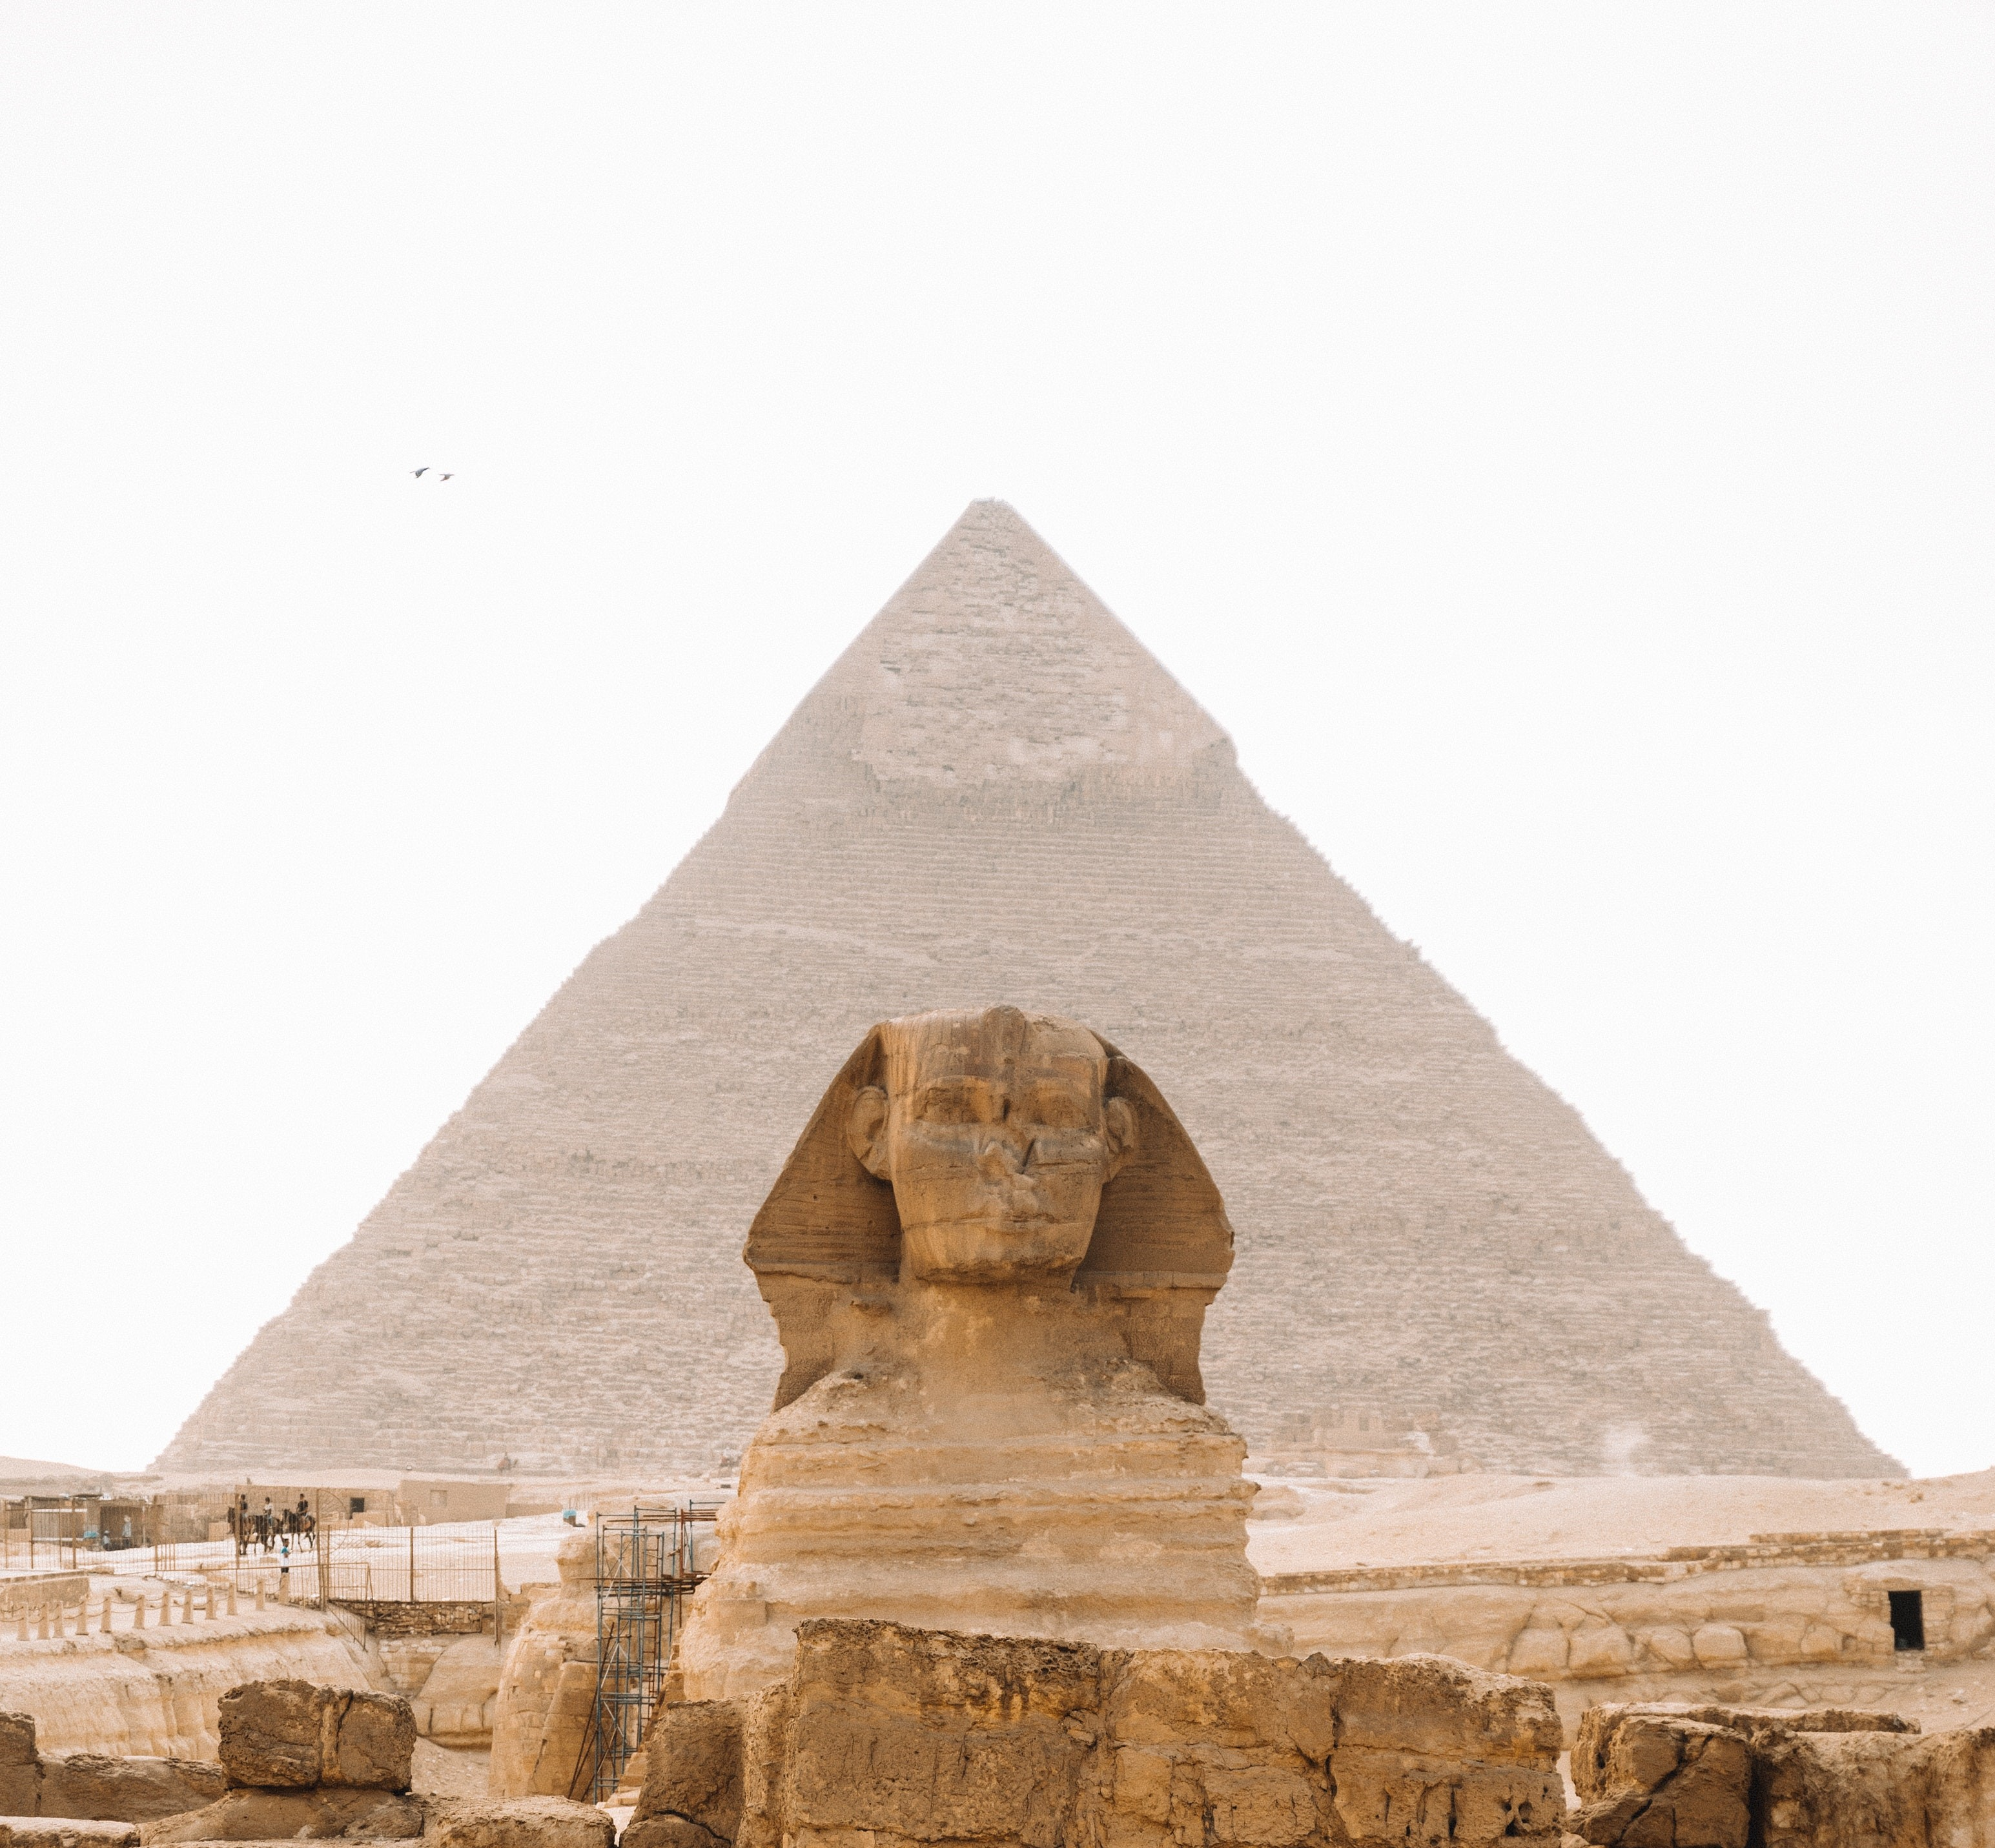 Course Image {mlang en}Exeptional in EGYPT{mlang} {mlang de}Außergewöhnlich in ÄGYPTEN{mlang}